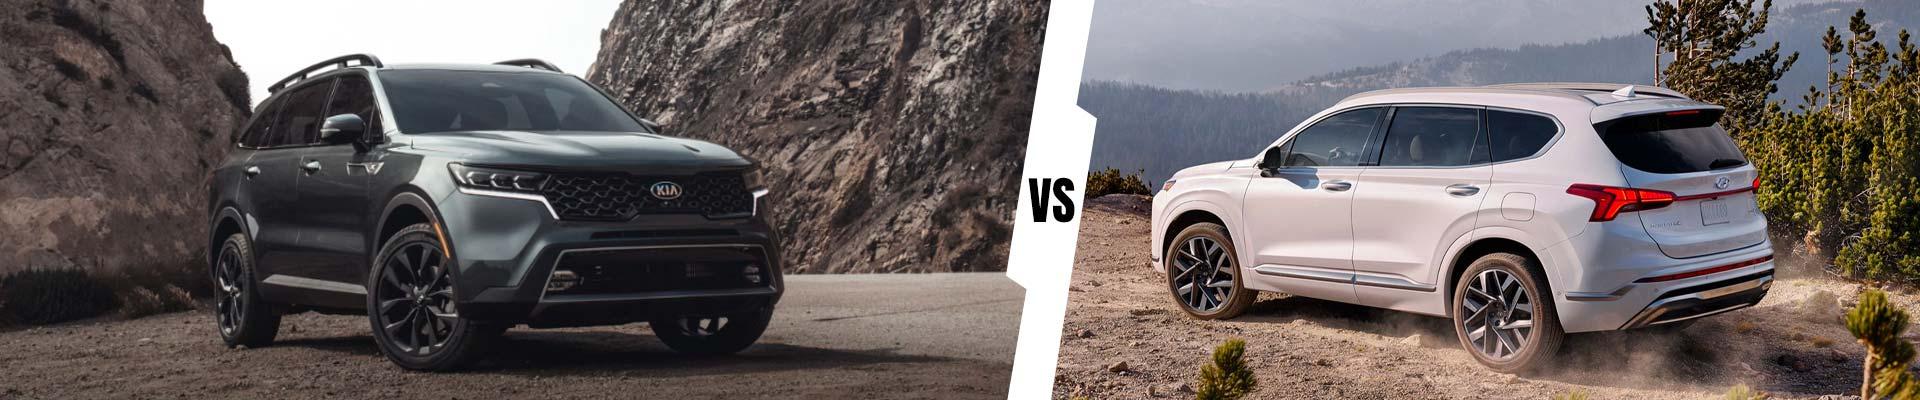 Mid-Size SUV Comparison: 2021 Kia Sorento Vs. 2021 Hyundai Santa Fe